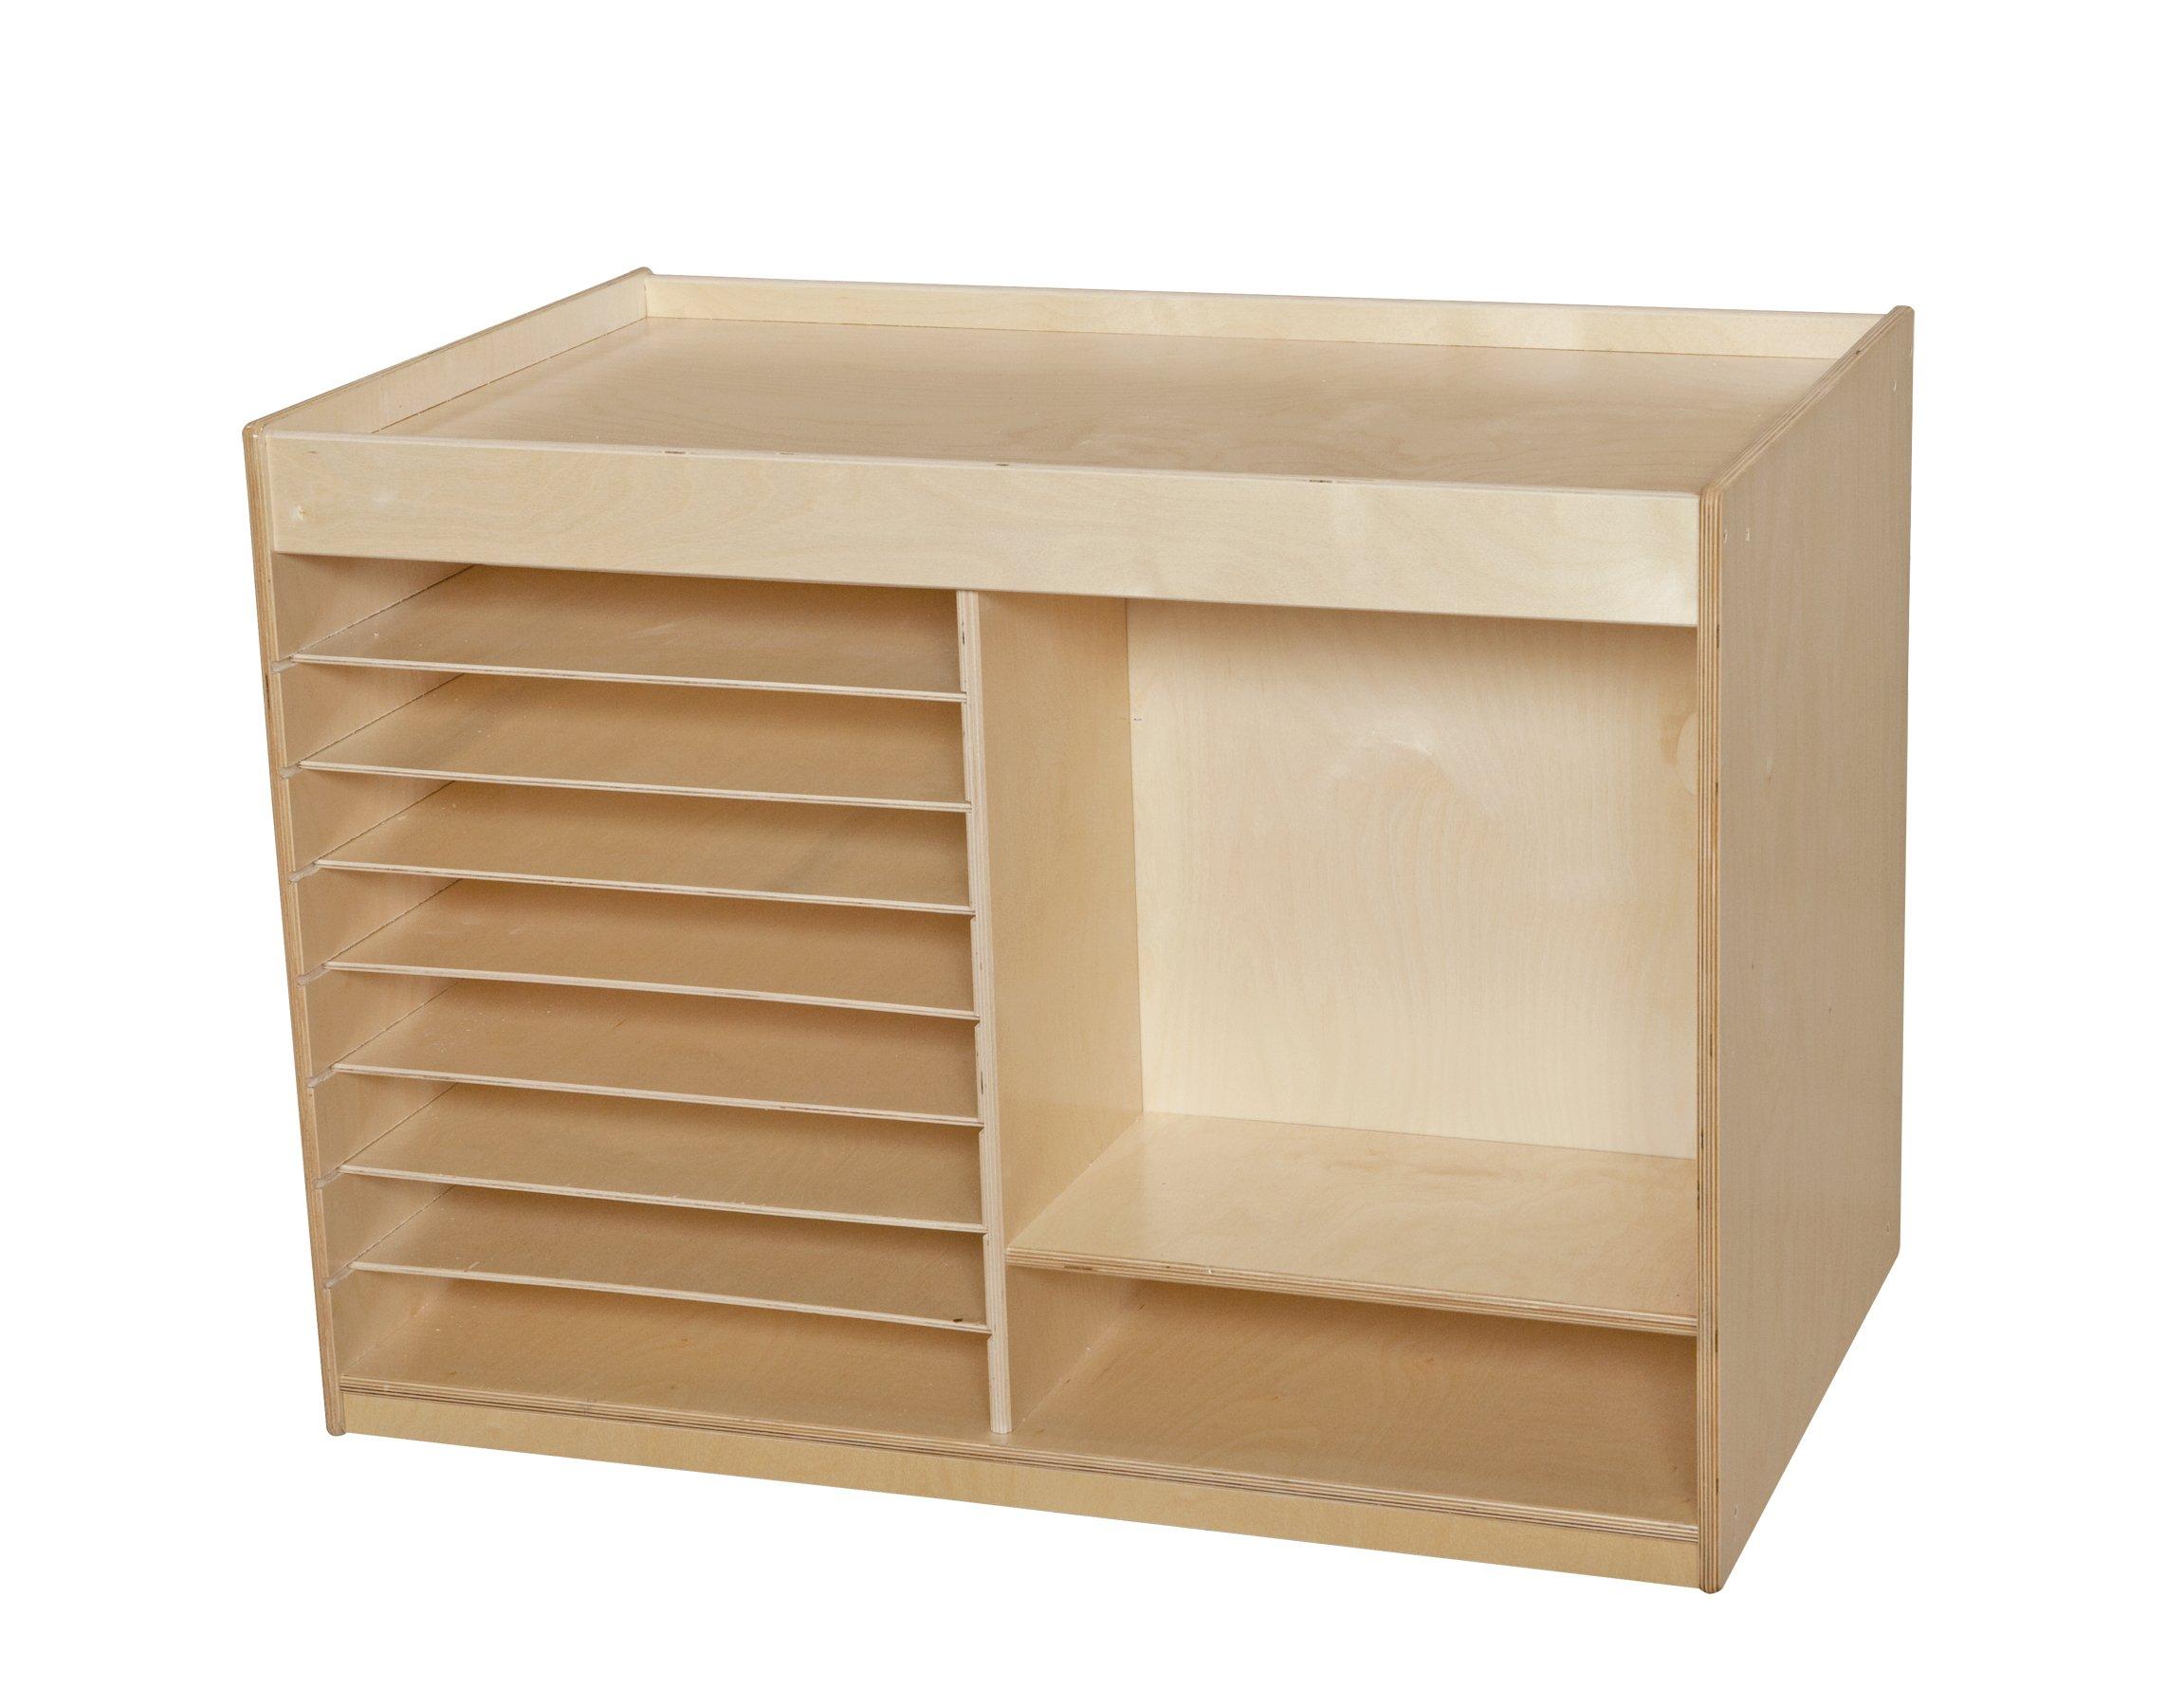 Wood Designs WD990249 Mobile Art Center